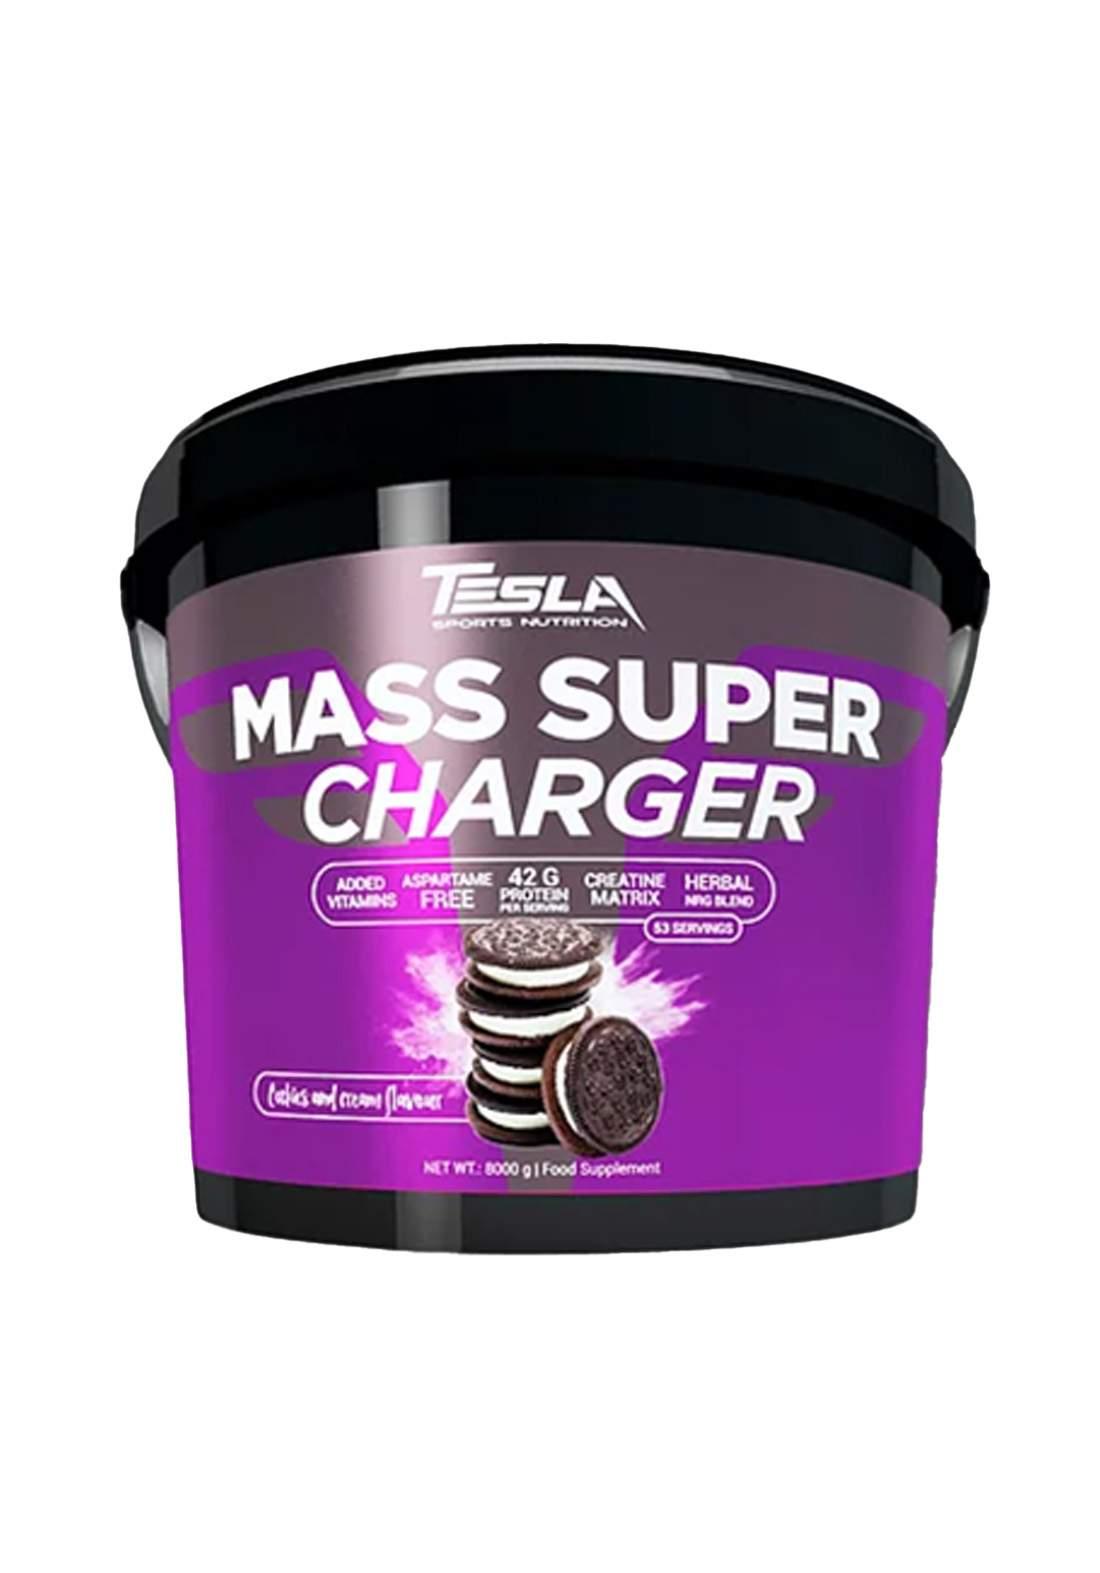 Tesla Mass Supercharger Cockies And Cream Flavor 8kg  مكمل غذائي بنكهة الكعك والكريمة